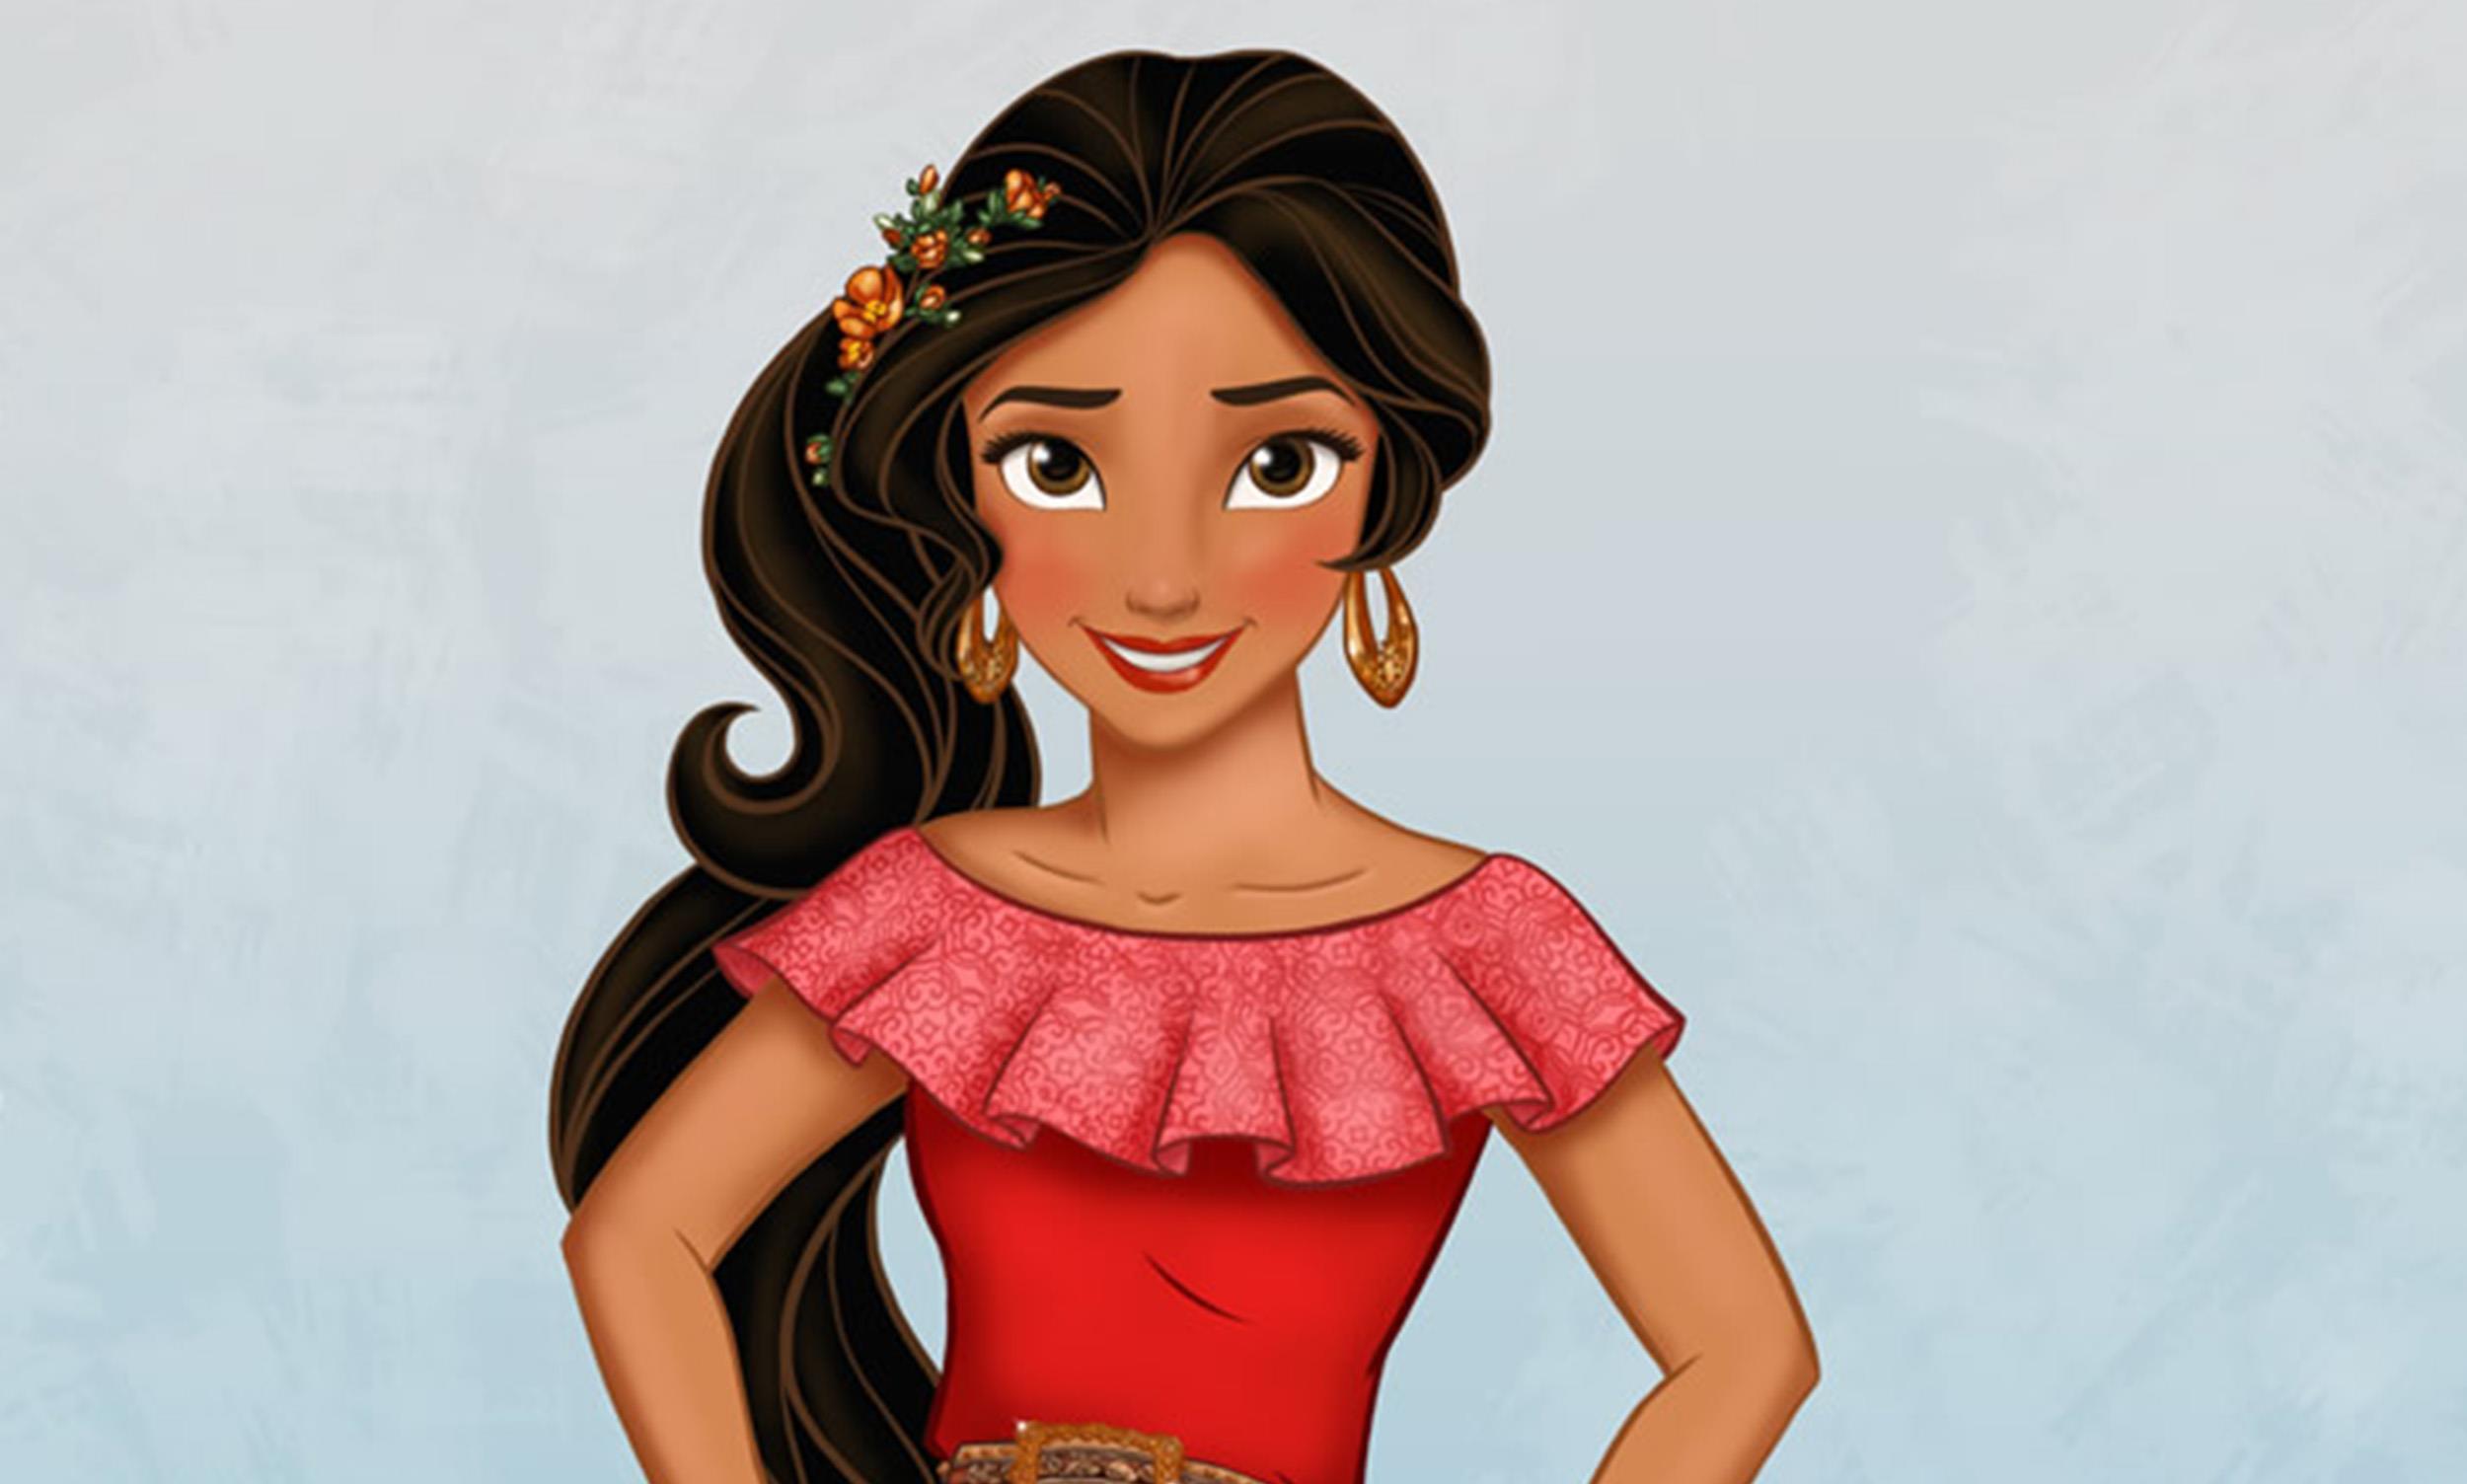 Voices A Latina Disney Princess Works For Me